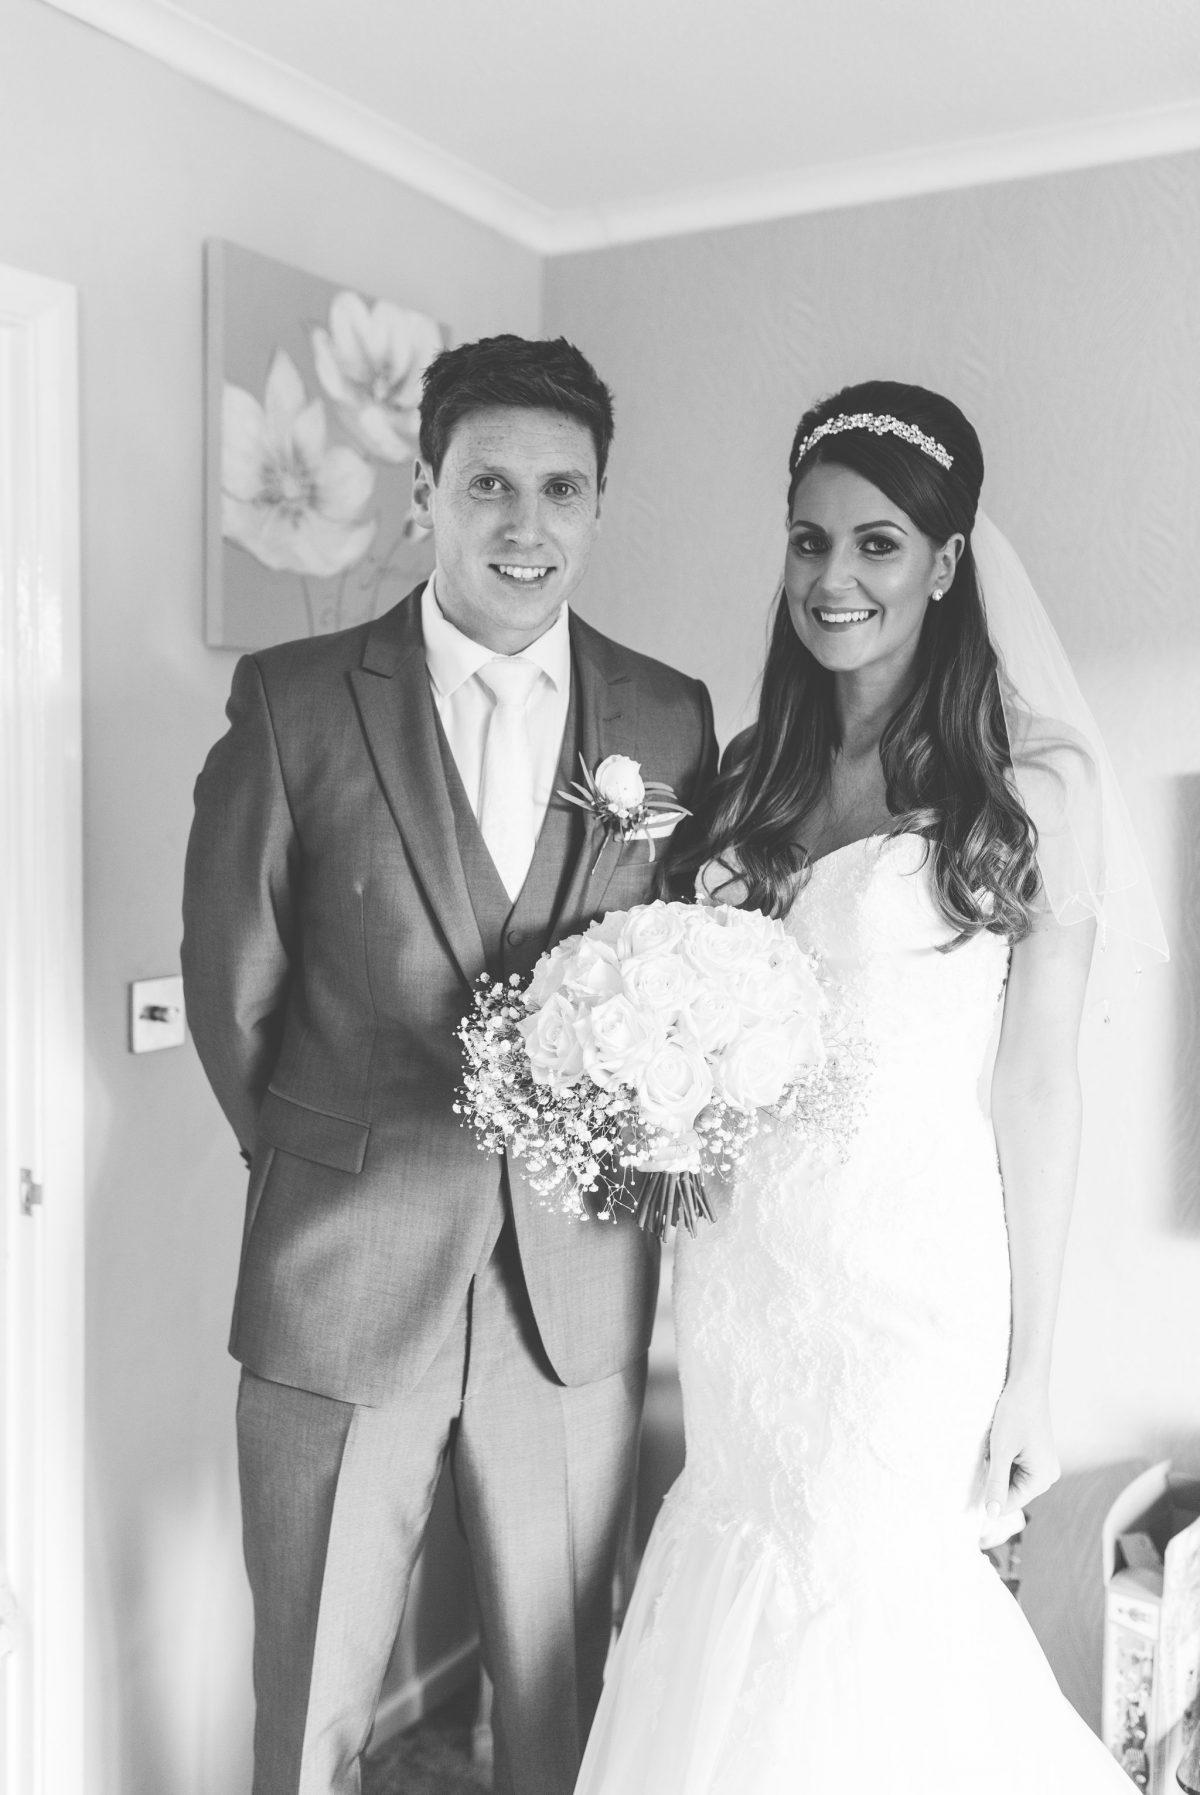 welsh_wedding_photographer_rachel_lambert_photography_decourceys_cardiff_rhiannon_gavin_ 19